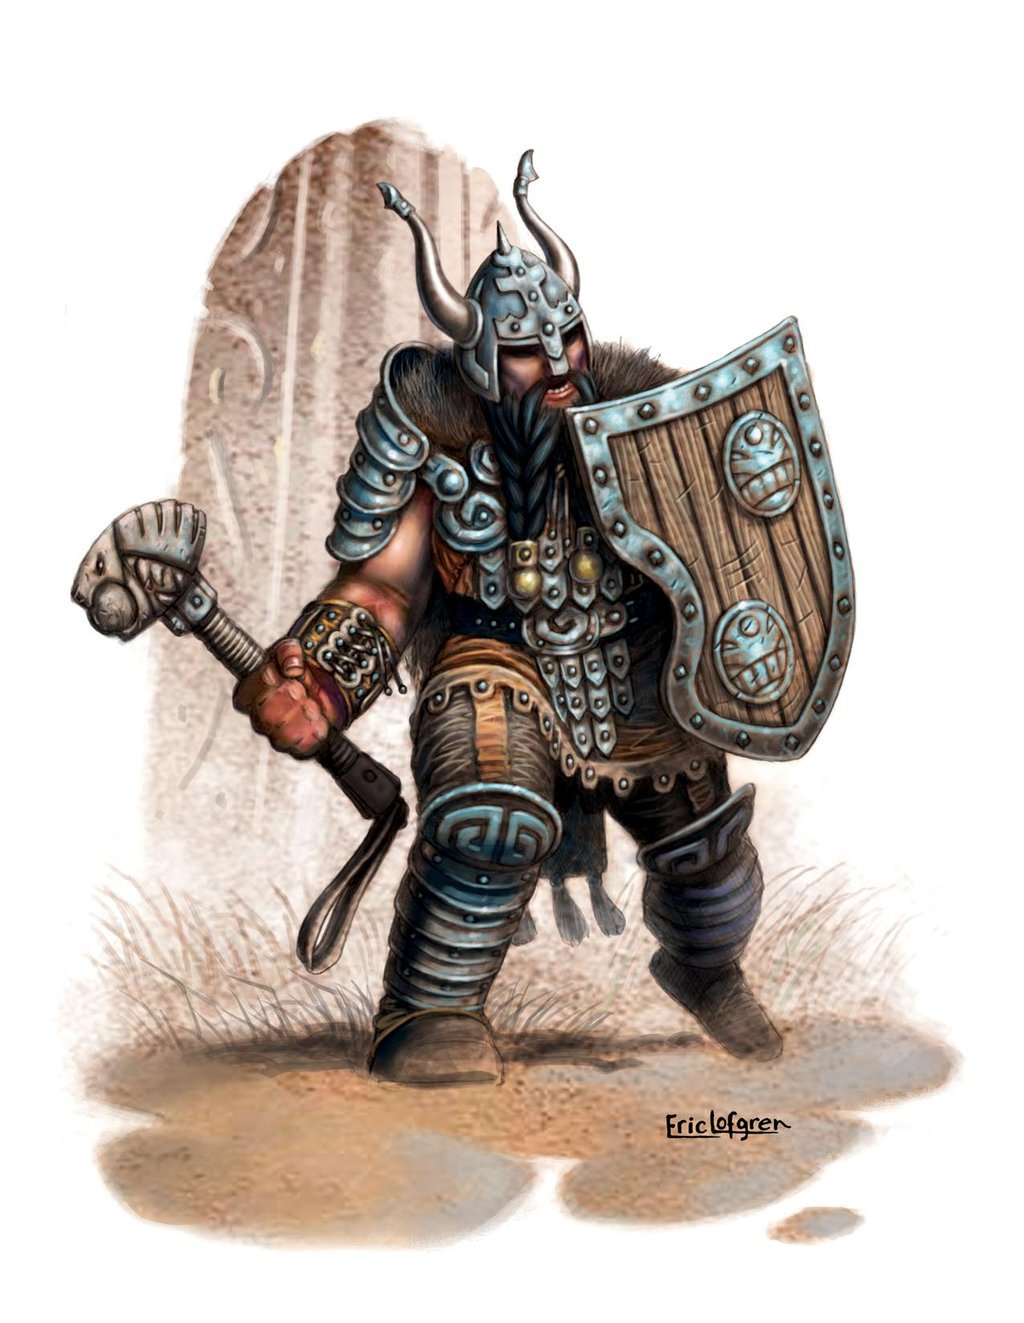 Drawn warrior giant Doing stared giant were Belegar